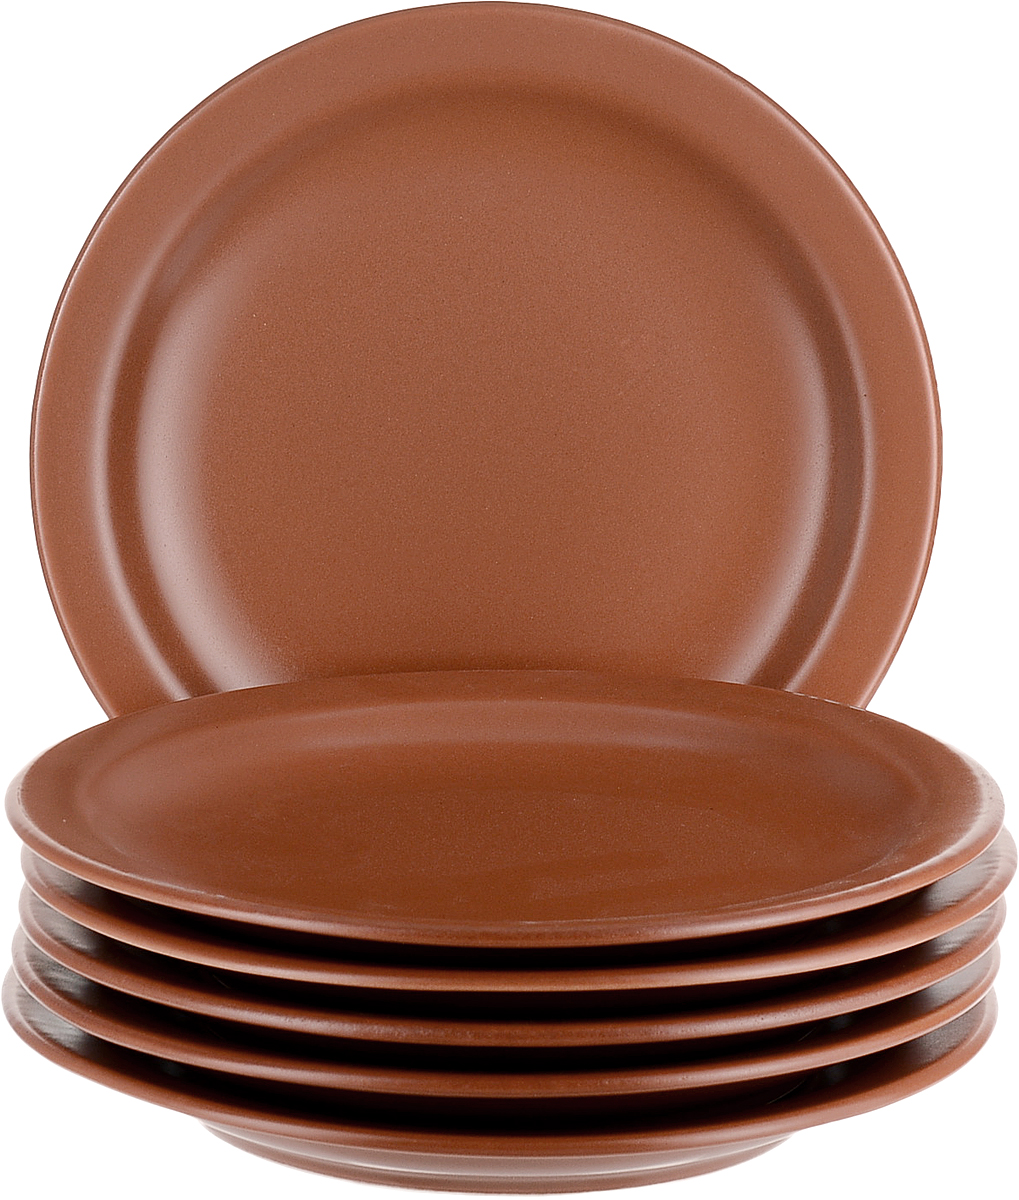 Набор тарелок обеденных Biona Терракота, 26 см, 6 шт набор суповых тарелок biona май 22 см 6 шт